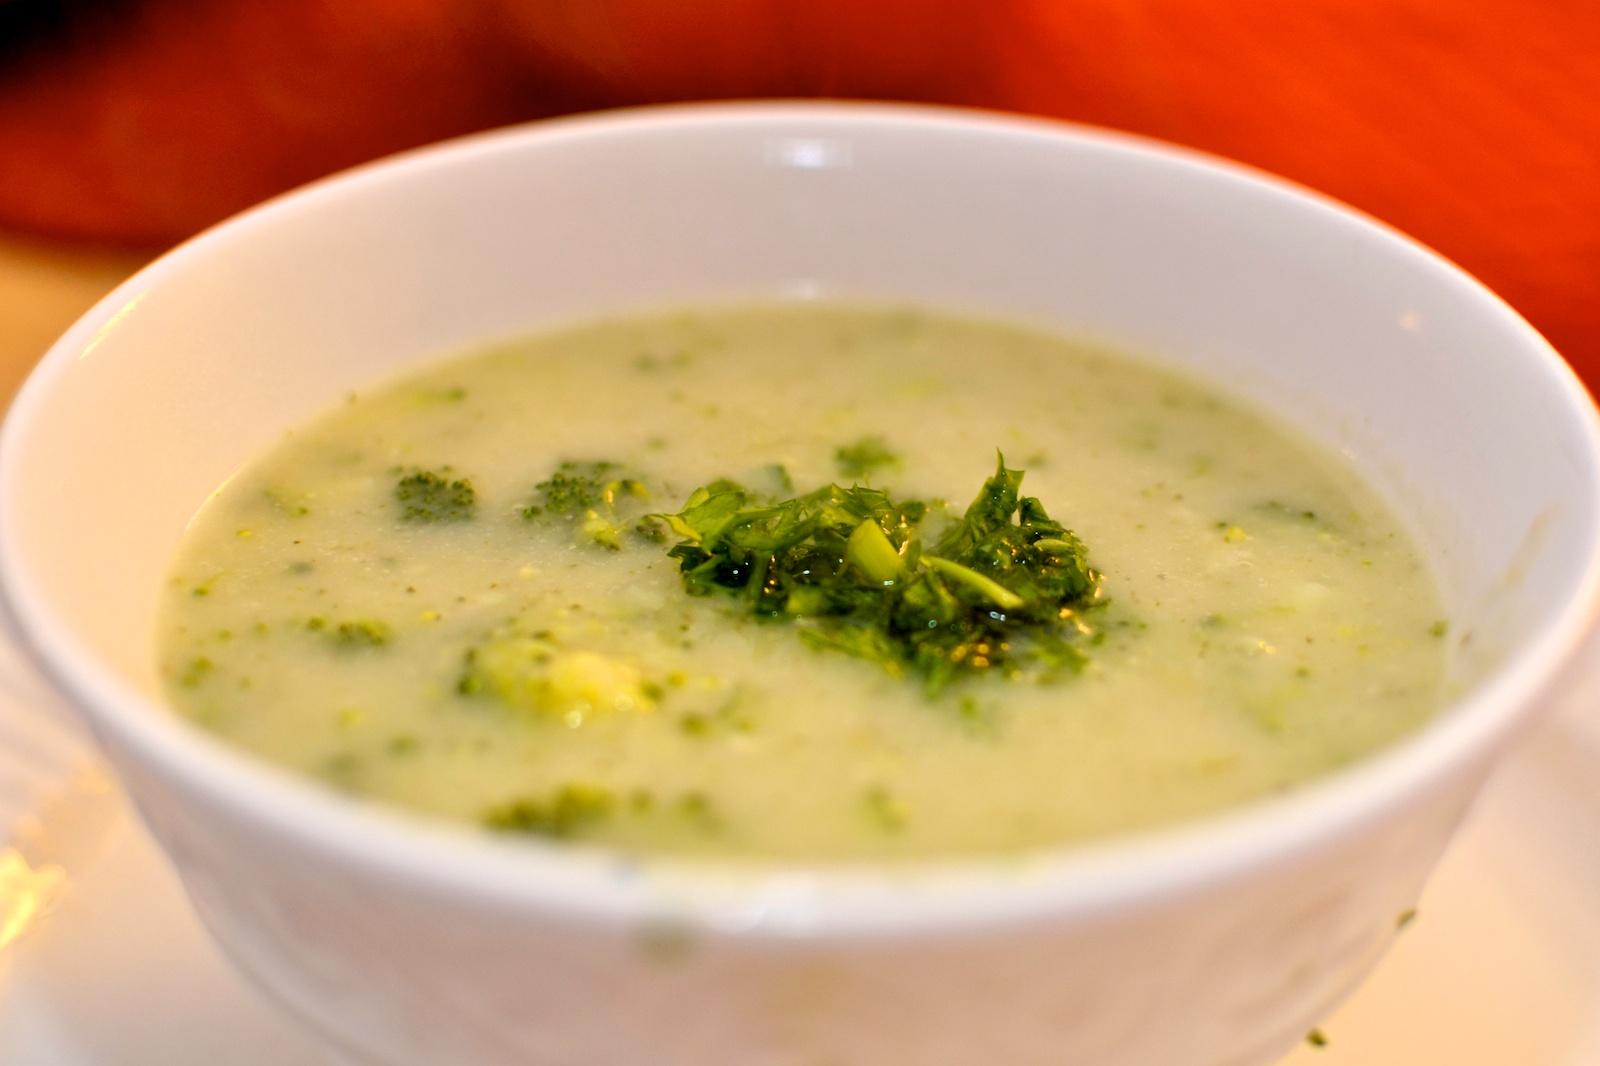 ... : Cooking for a Healthy Future: Creamy Coconut Milk Broccoli Soup